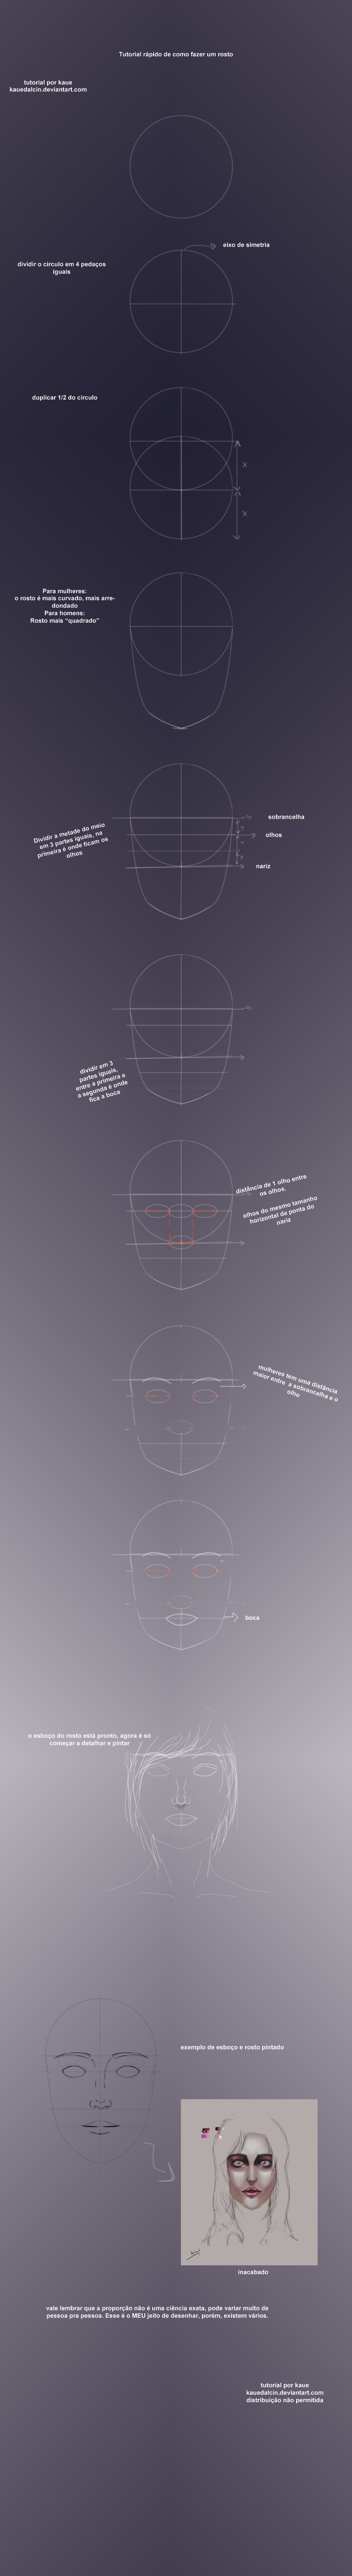 Tutorial rosto by KaueDalcin